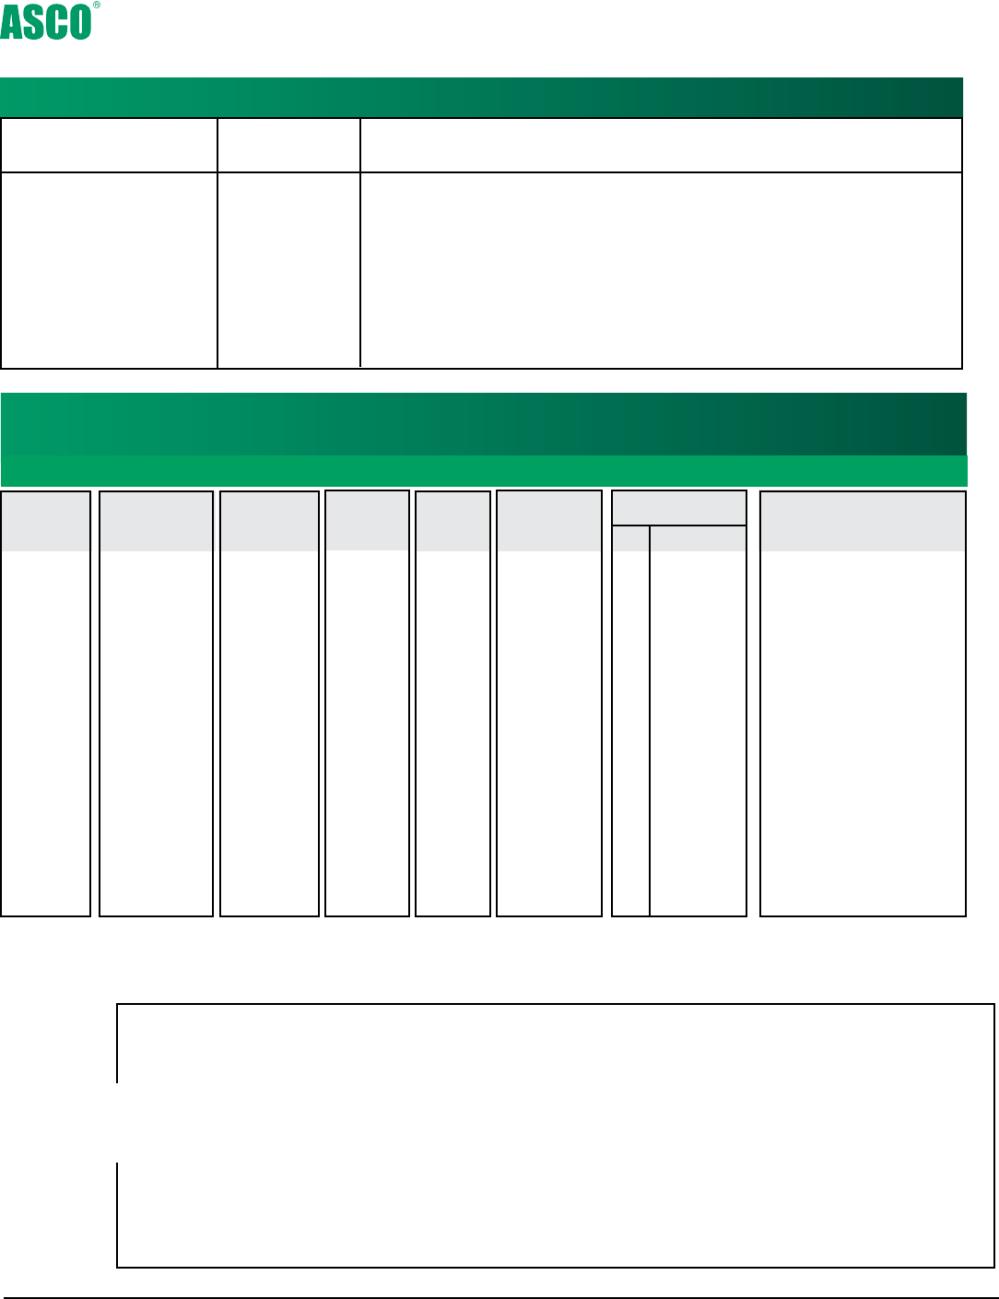 medium resolution of asco 641 lighting contactor panel